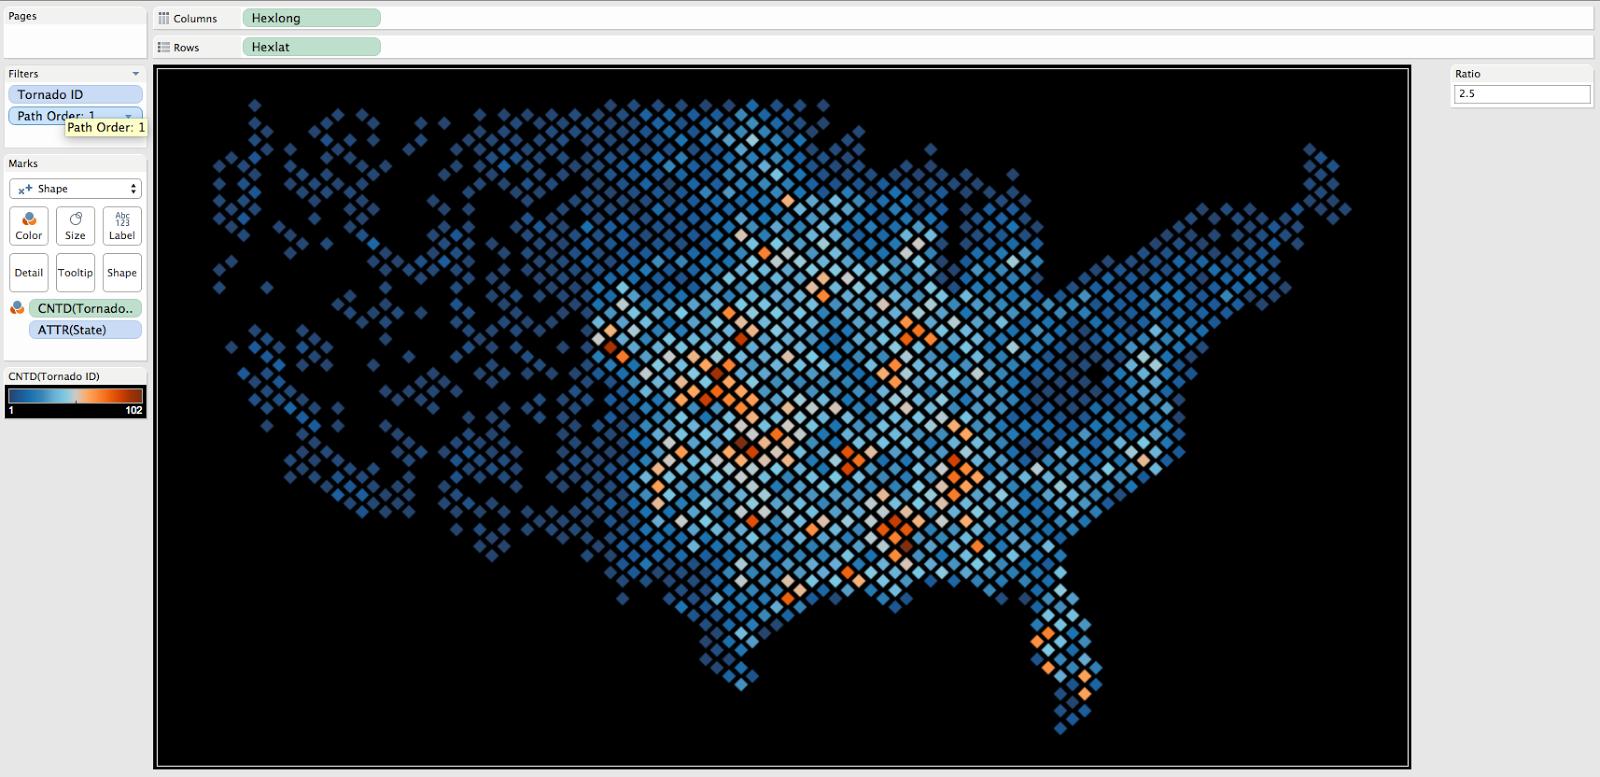 How To Density Maps Using Hexbins In Tableau